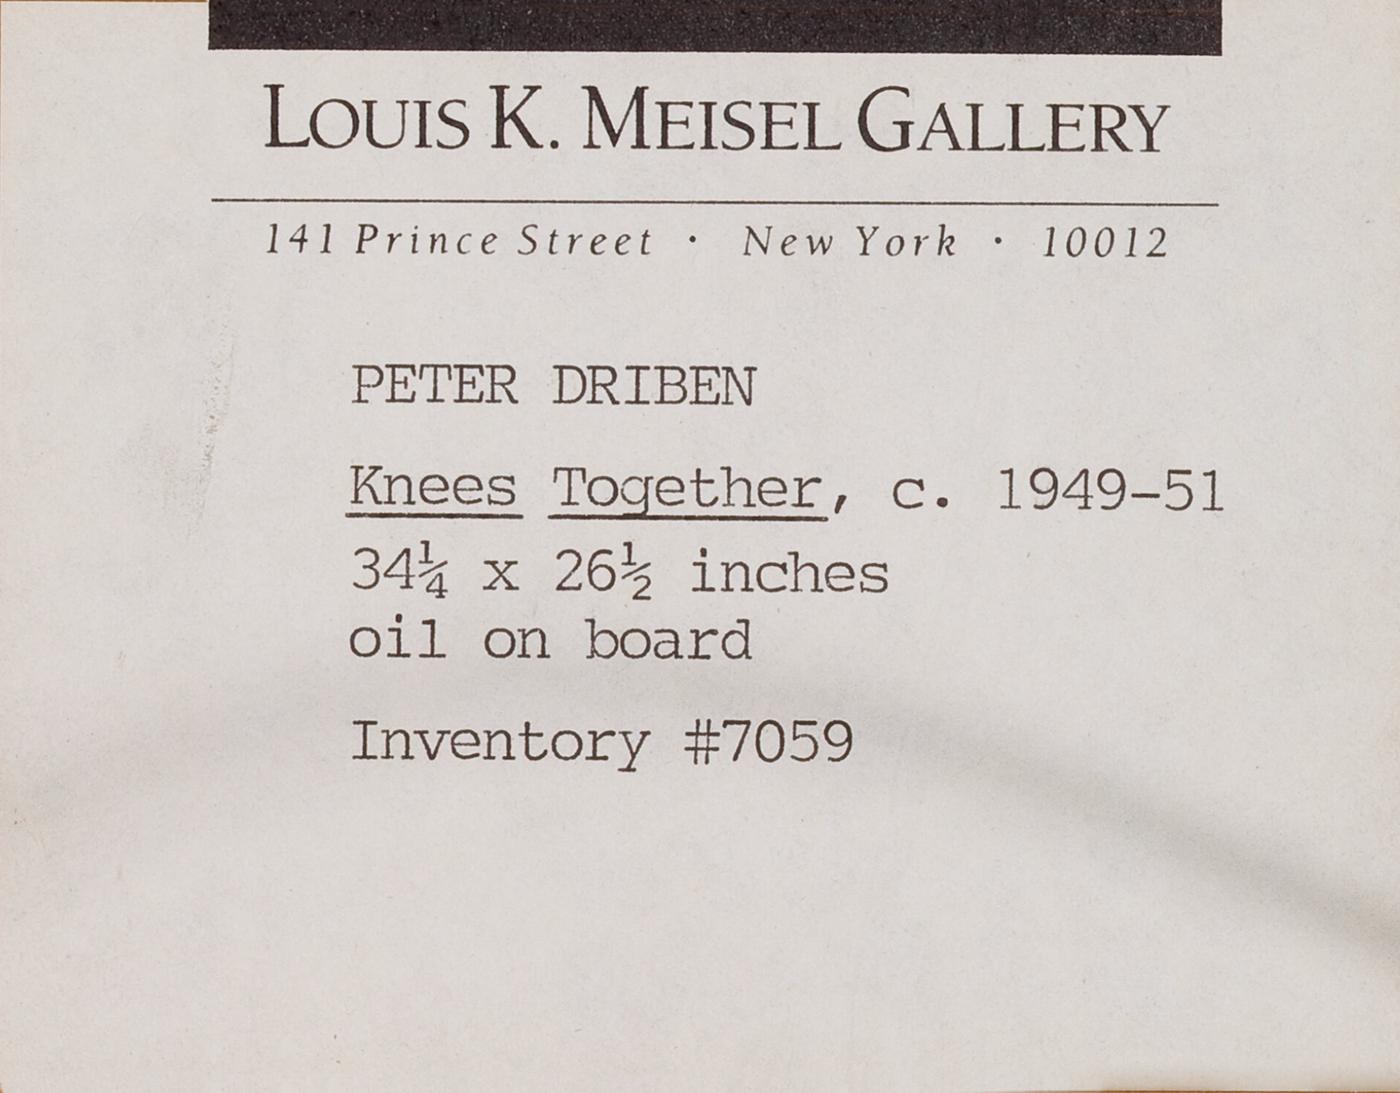 Louis K. Meisel Gallery label on verso